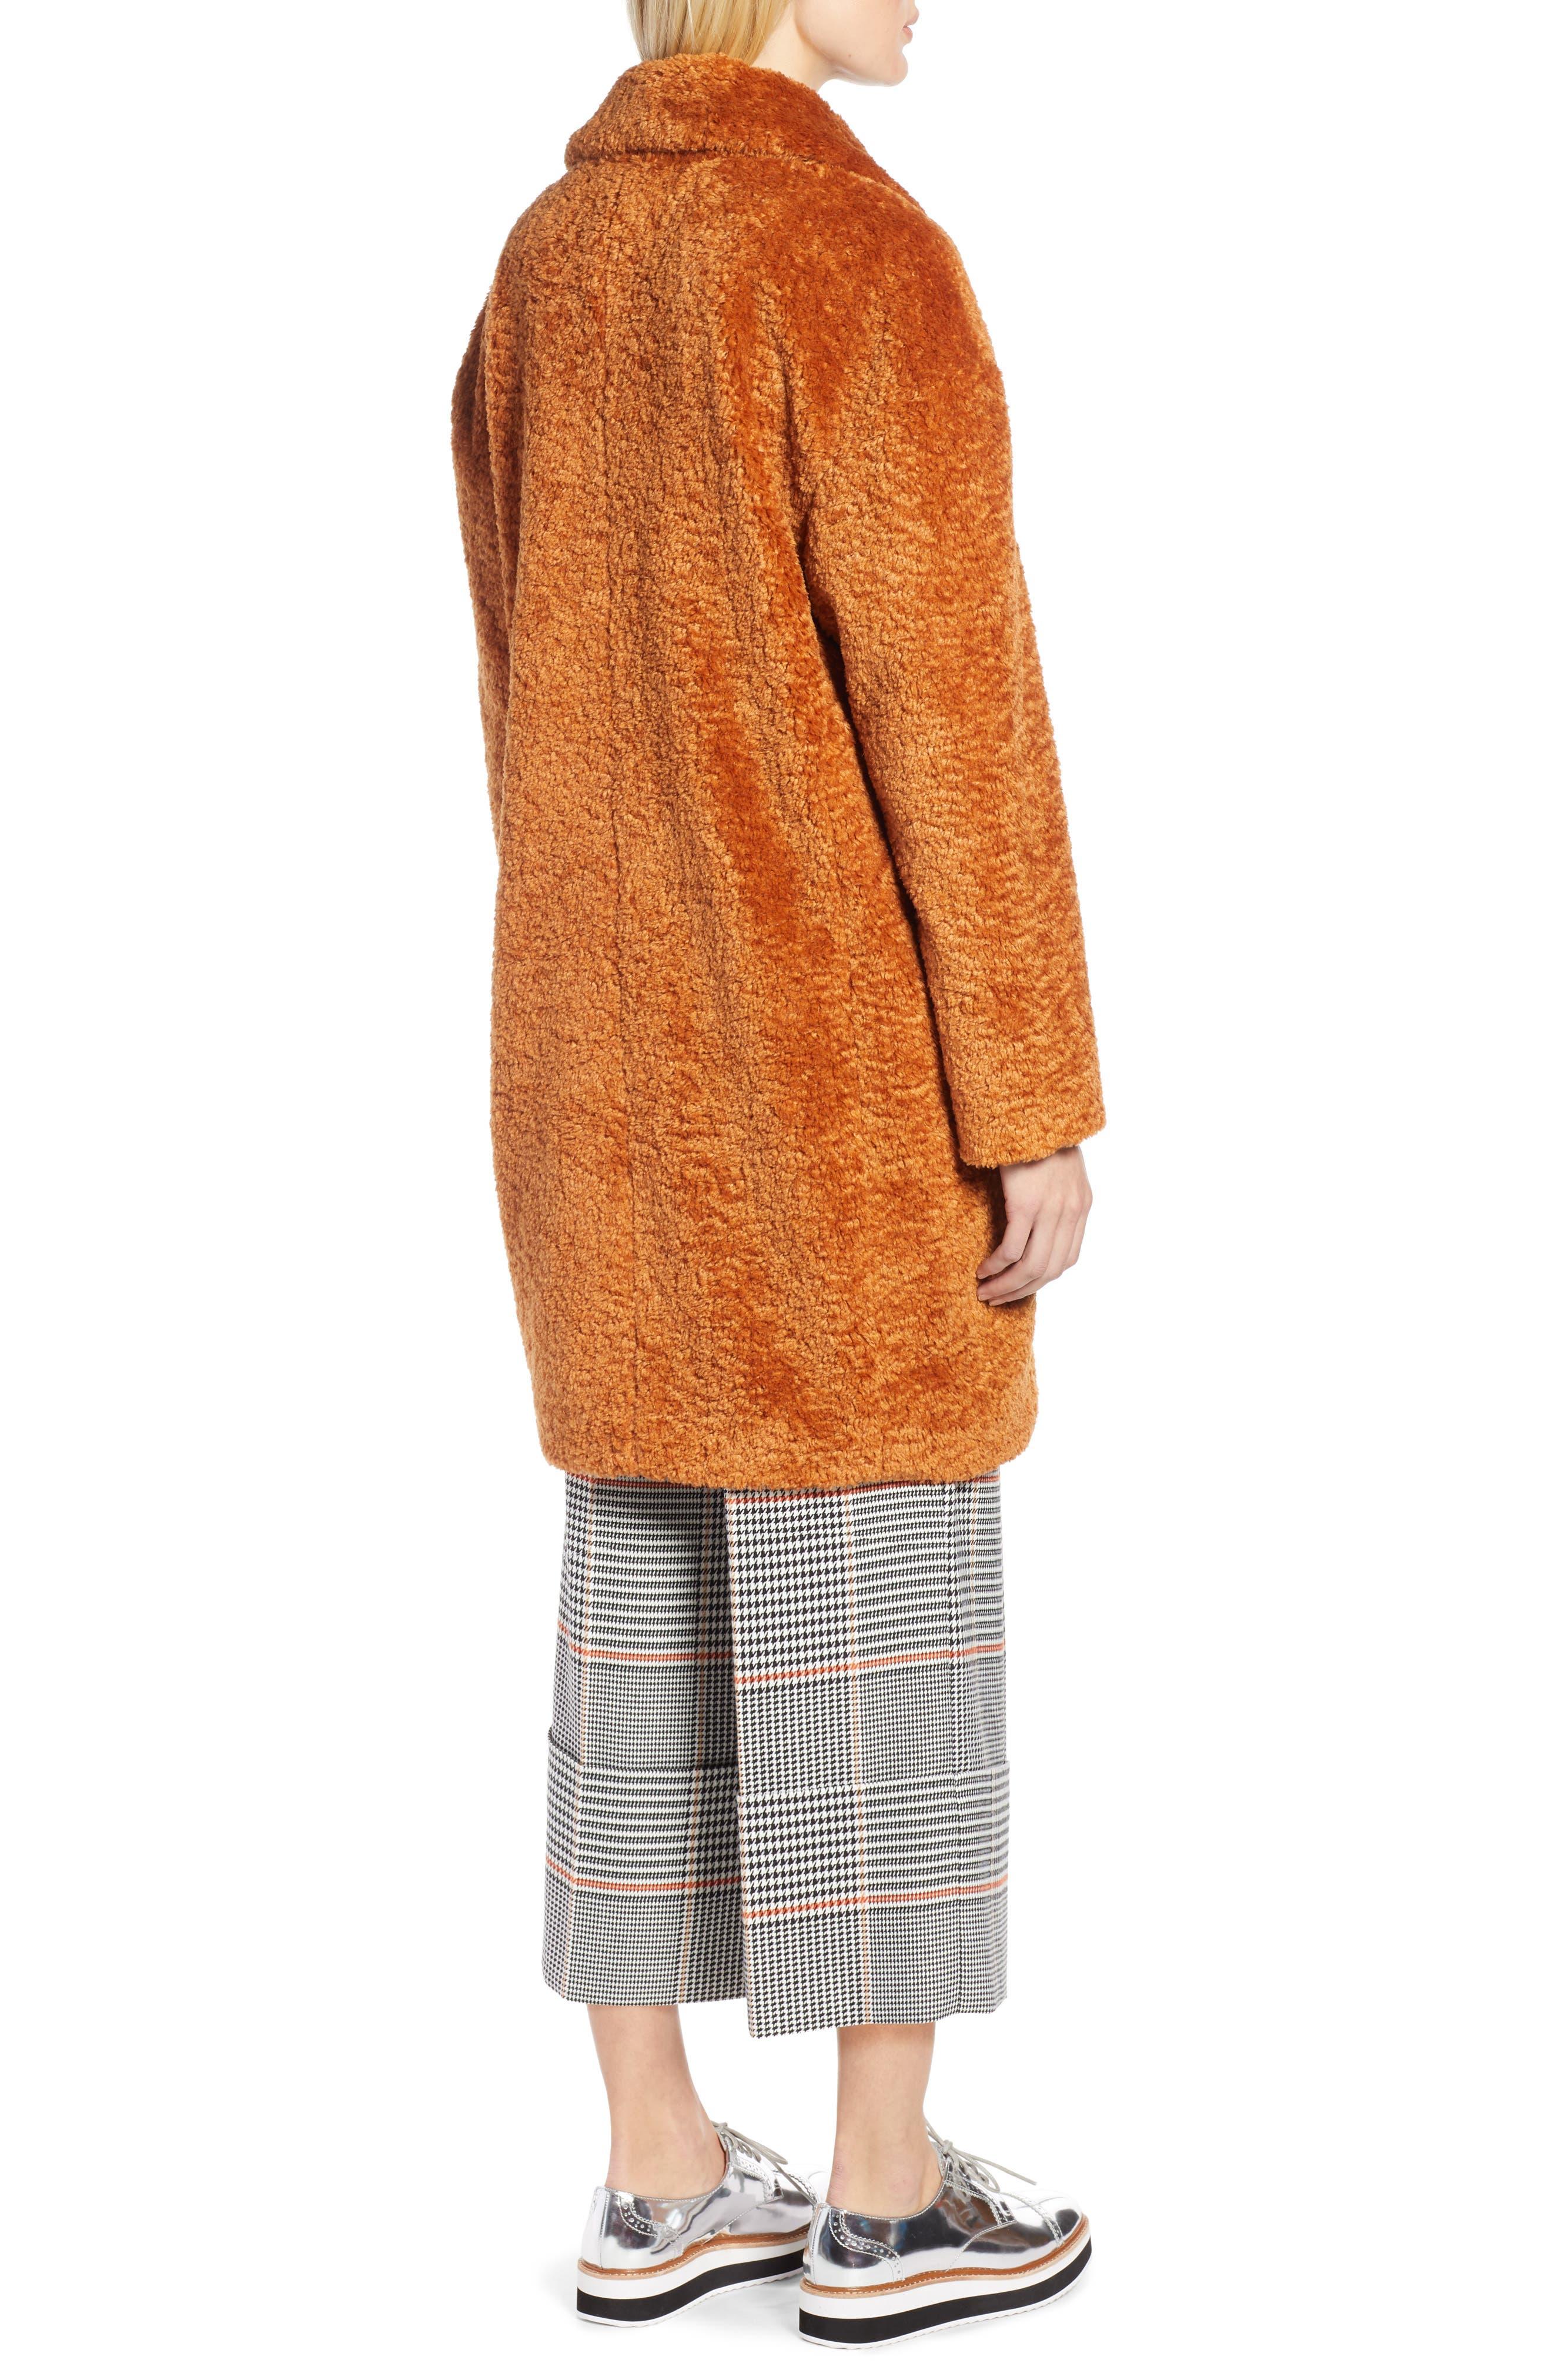 x Atlantic-Pacific Faux Fur Coat,                             Alternate thumbnail 2, color,                             RUST GINGER